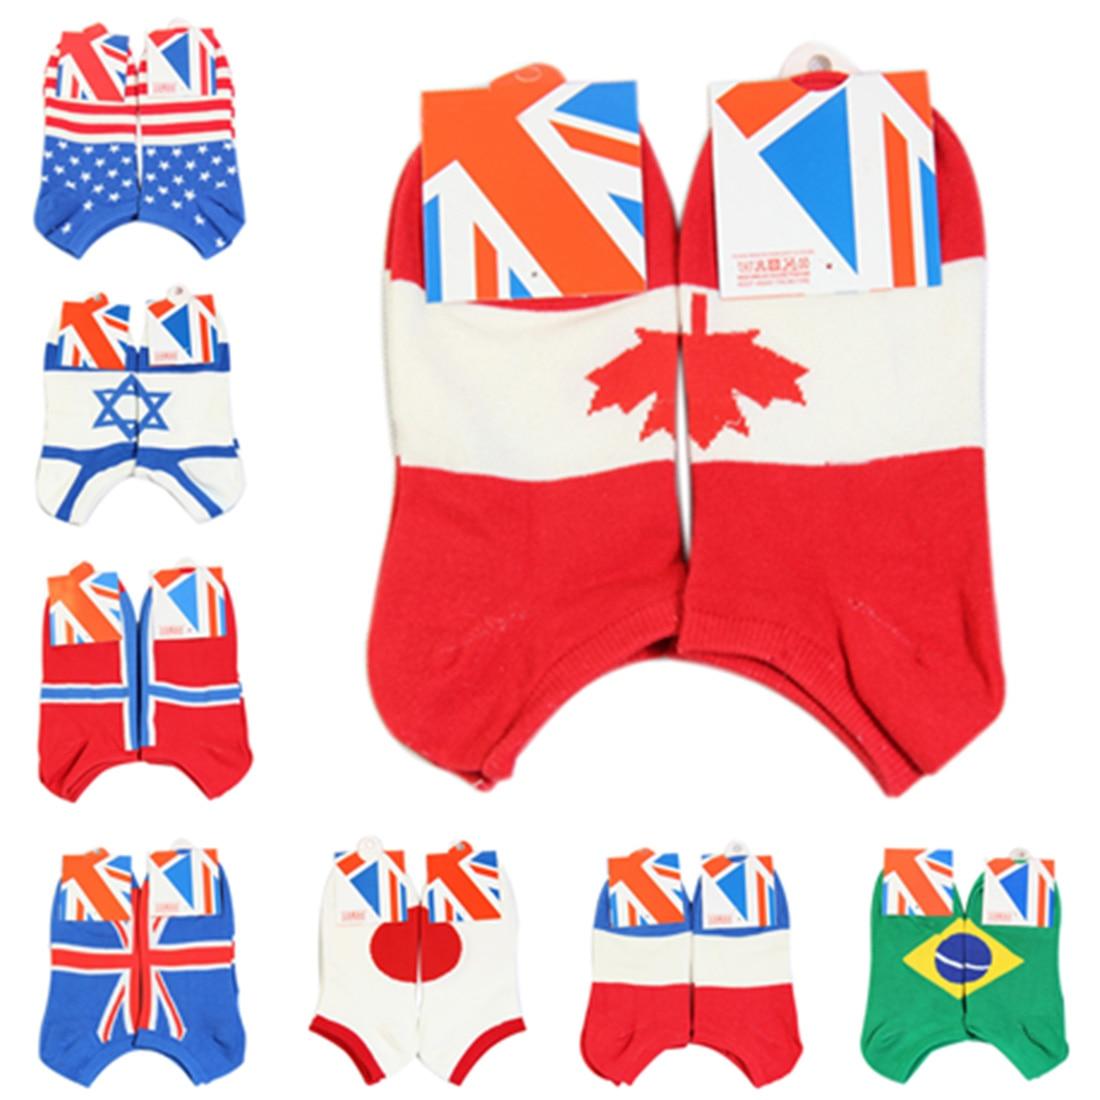 Hot Sale Soccer Man Socks USA UK Israel Brazil Norway Japan Canada Flag Socks Cotton Meias Men's Socks Spring Socken